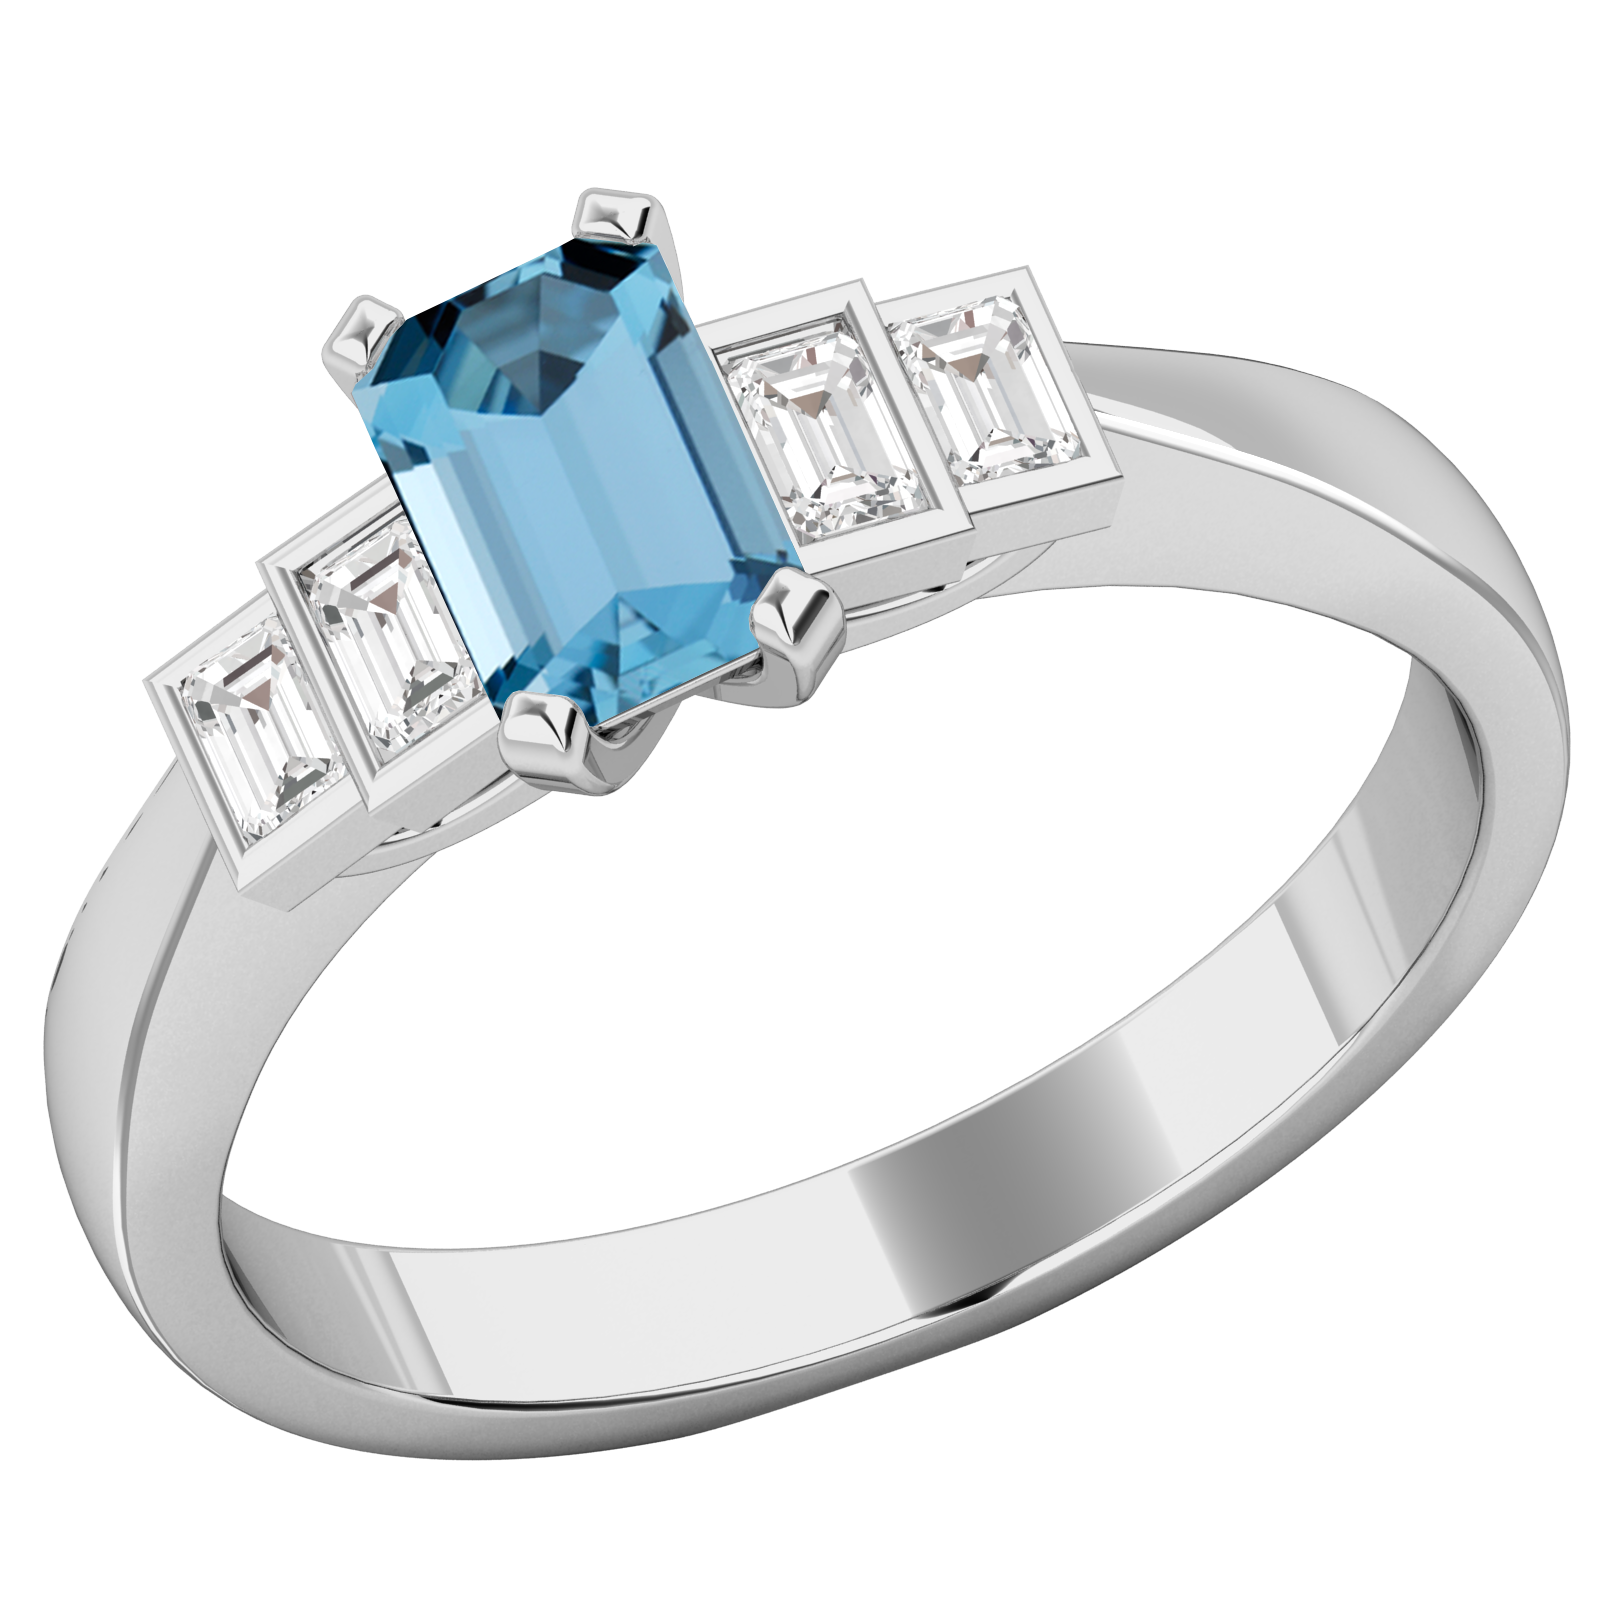 RDAQ717W-Inel cu Acvamarin si Diamant Dama Aur Alb 18kt cu un Acvamarin Taietura Smarald si 4 Diamante Forma Bagheta,in Setare Rub-Over-img1